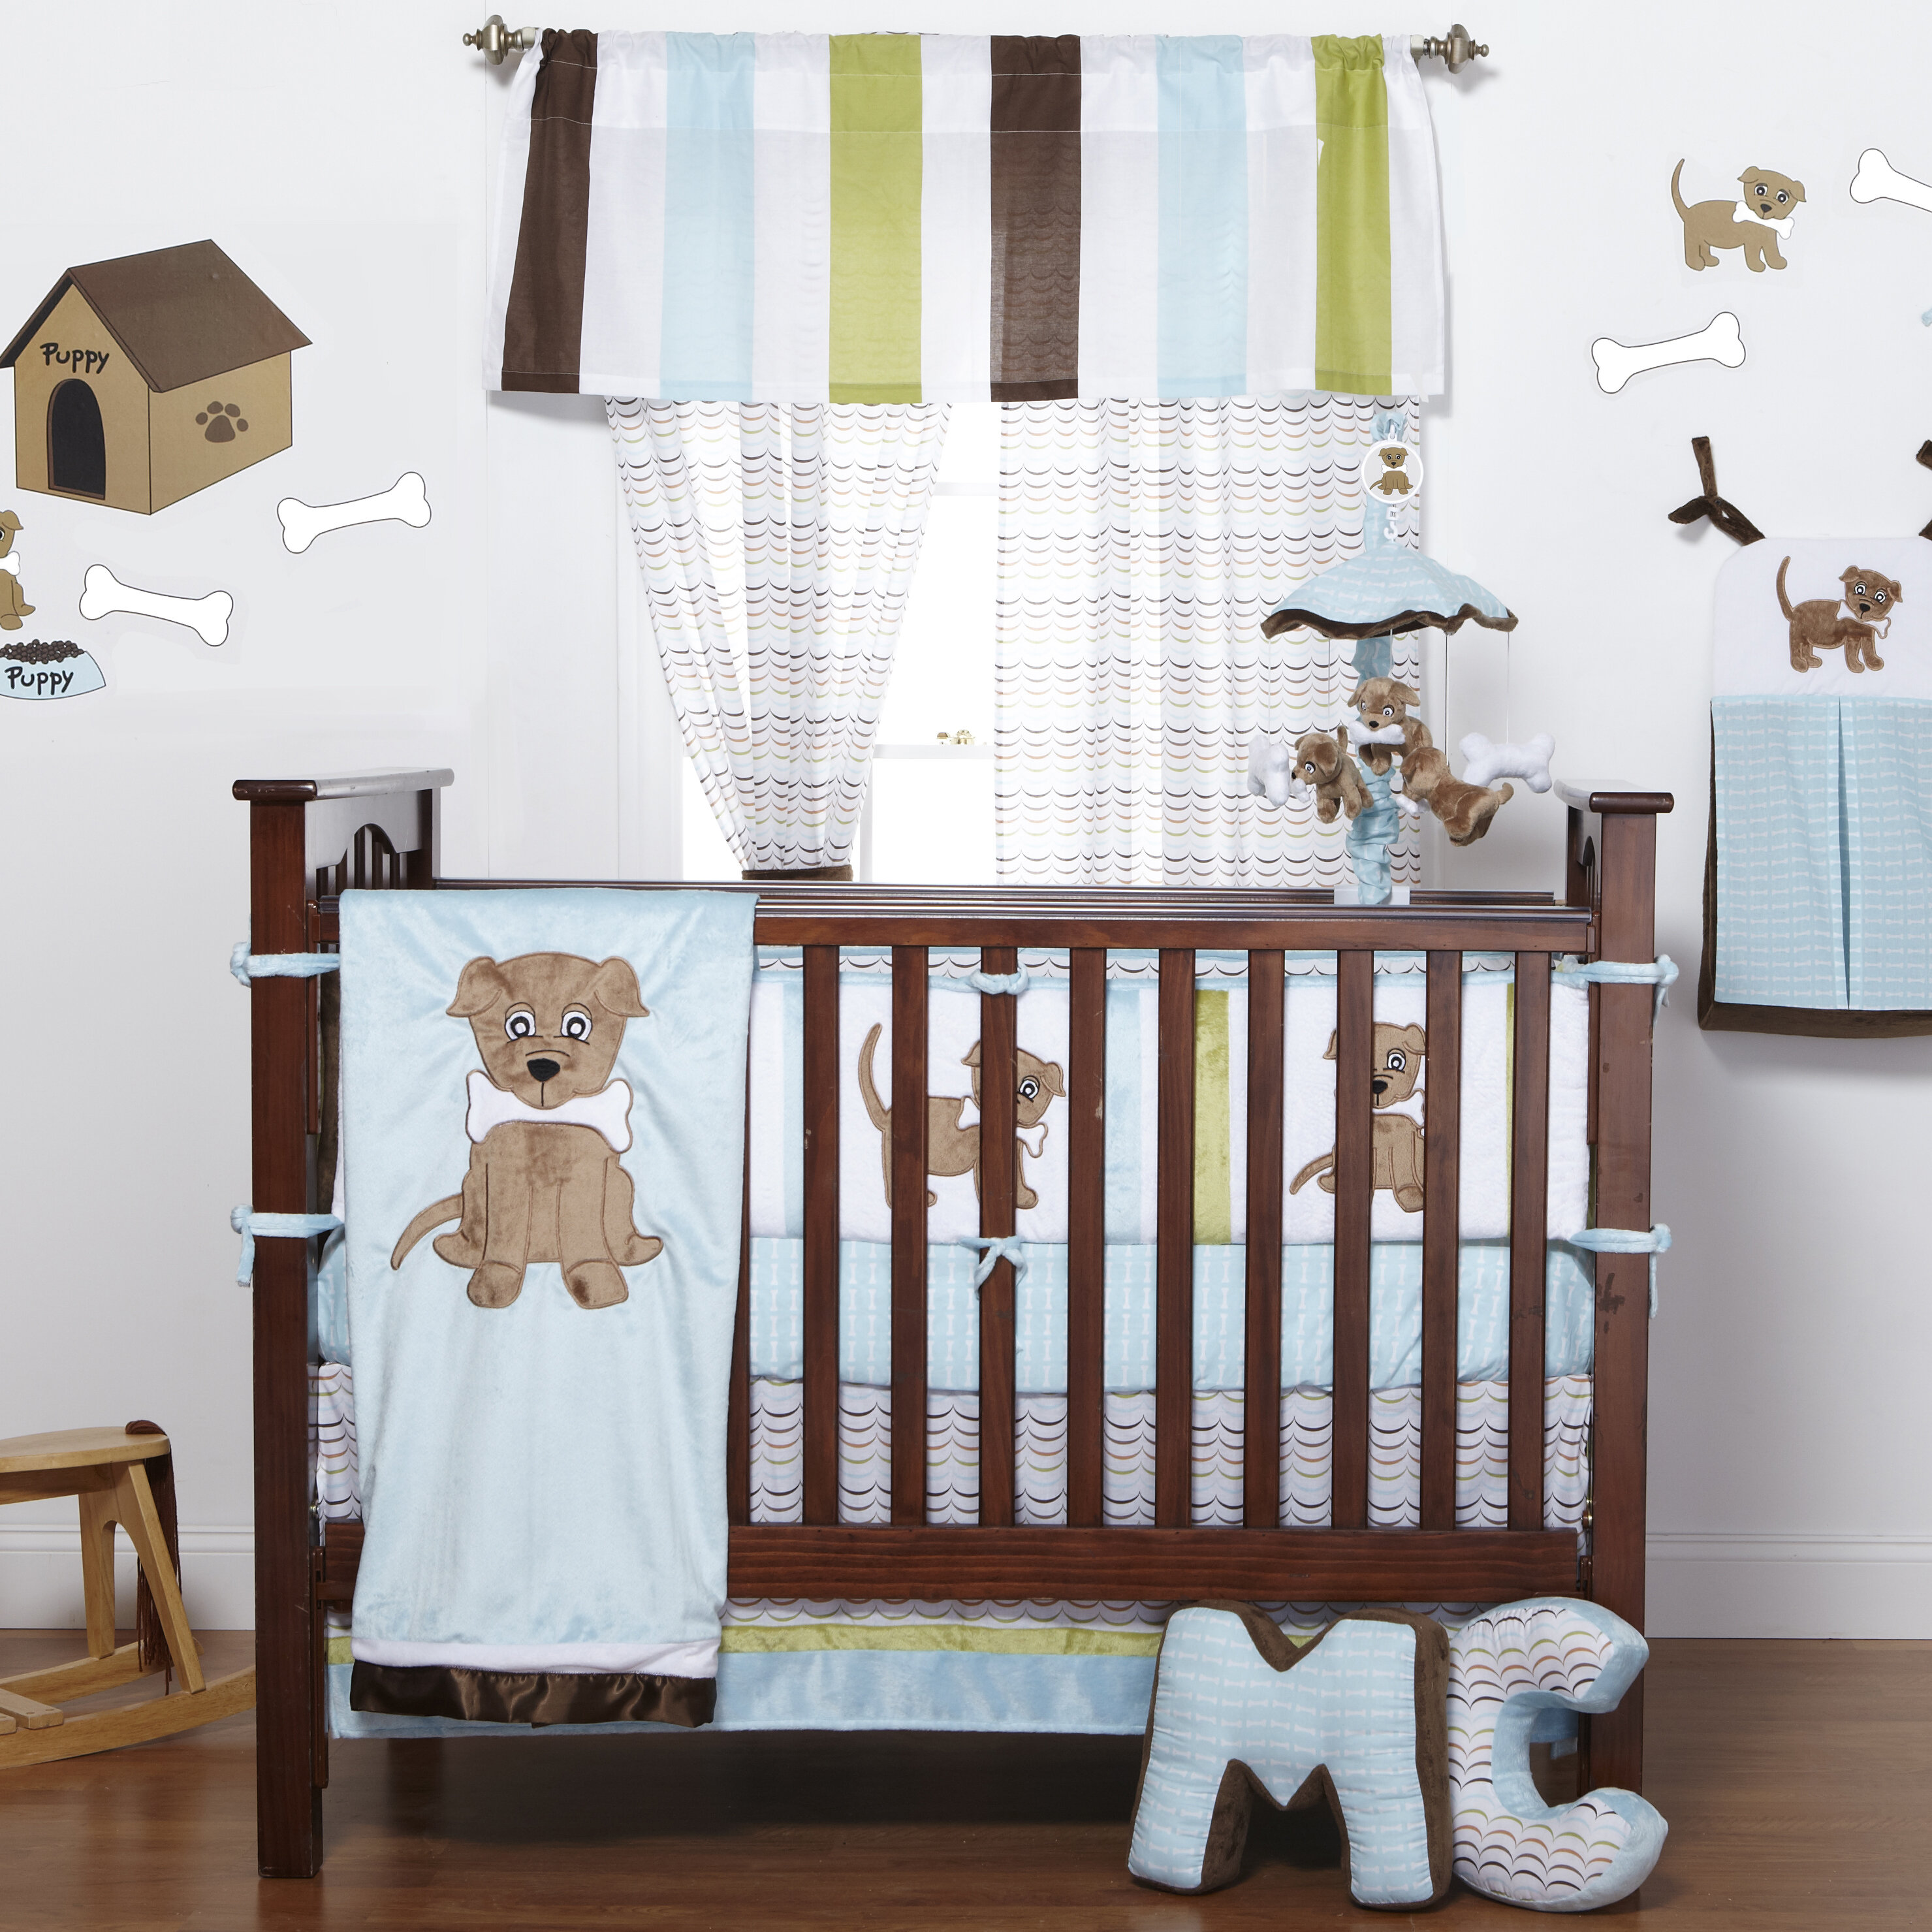 infant sheet crib cuddletime s skirt wid cribs qlt prod boy p pirates puppy spin hei comforter